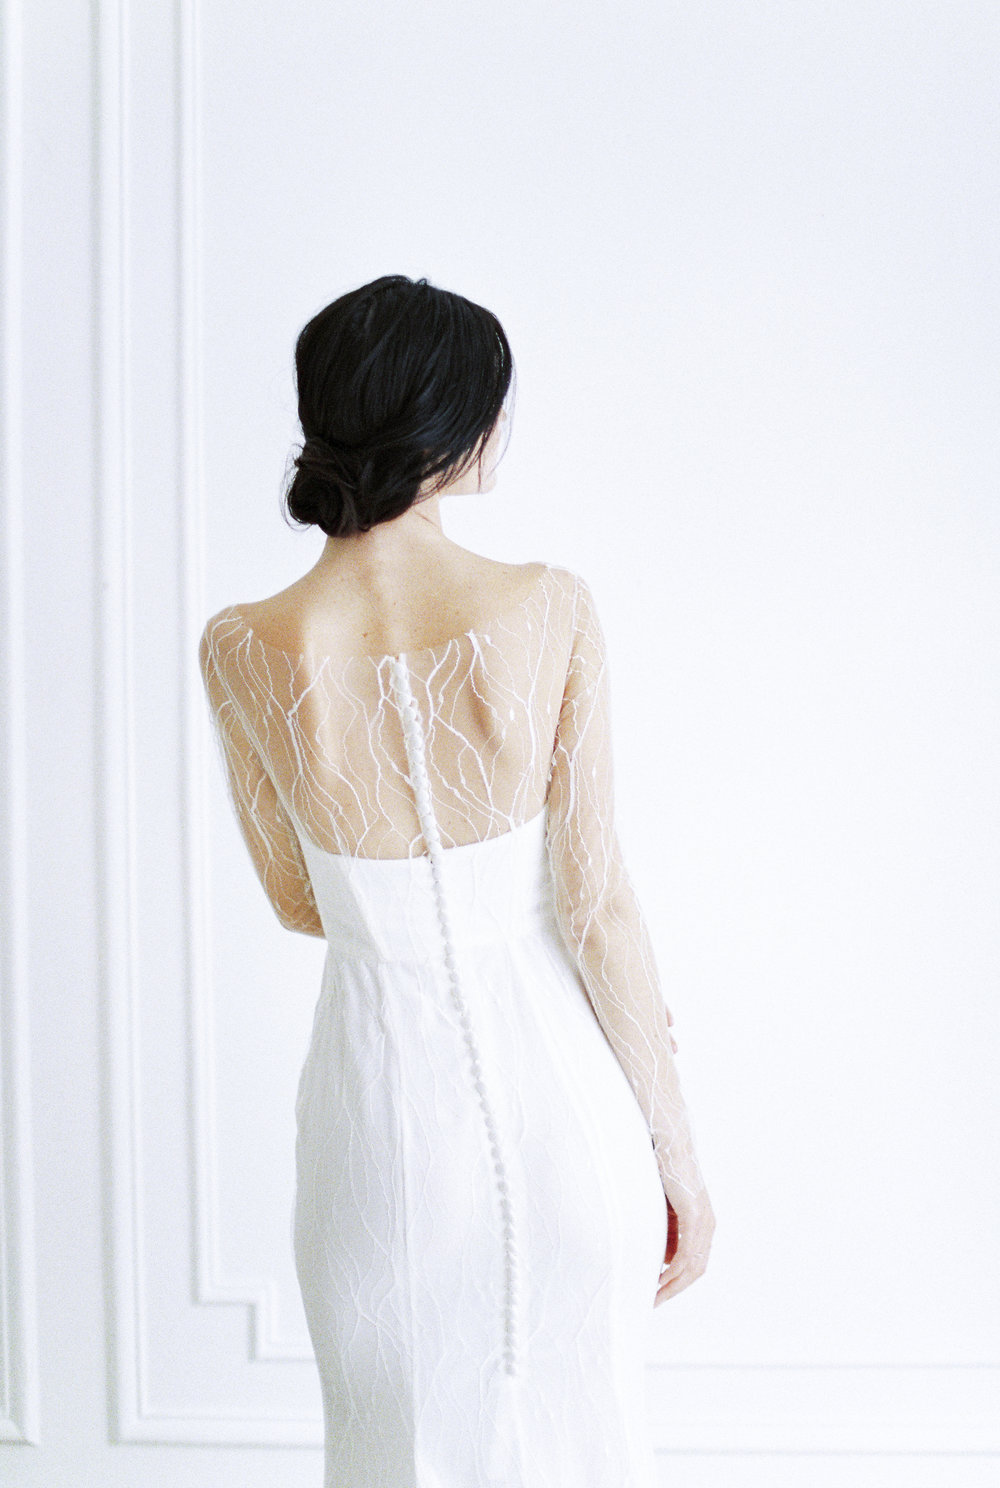 Ludovic Grau-Mingot - Film Photographer - Talitha - Wedding dresses - Collection 2019-155 (1).jpg